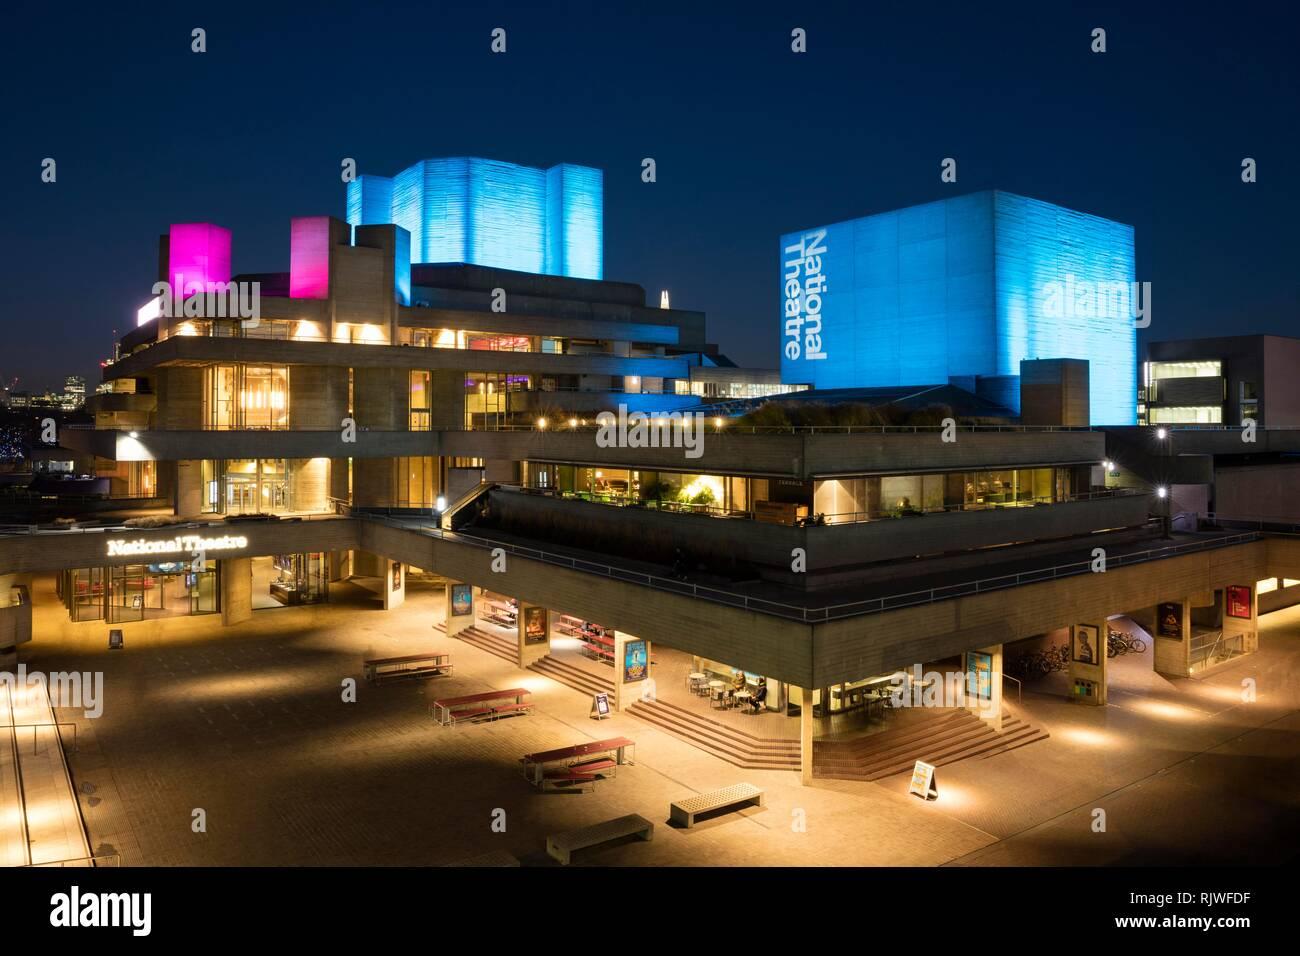 National Theatre, night shot, Southwark, London, England, Great Britain Stock Photo